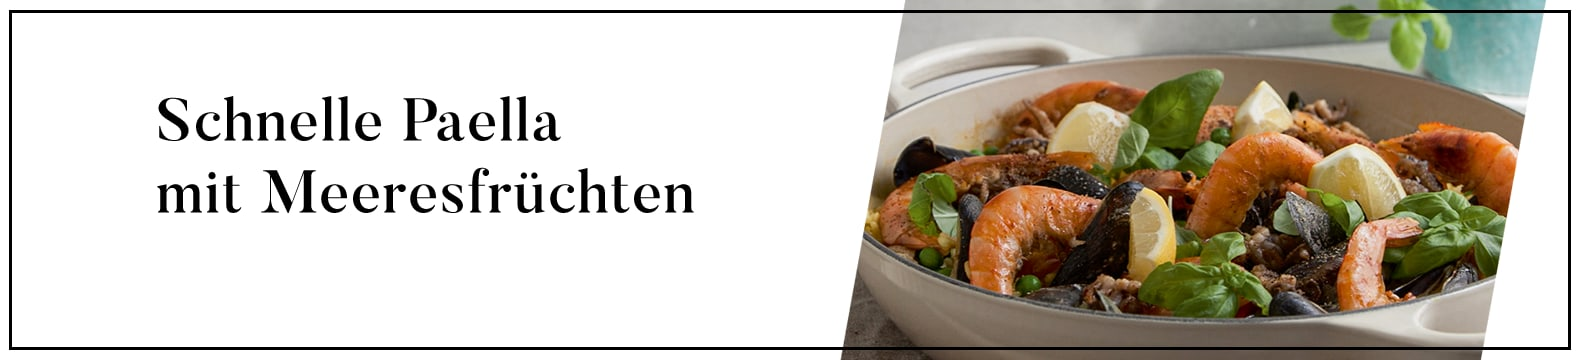 Schnelle Paella mit Meeresfruechten